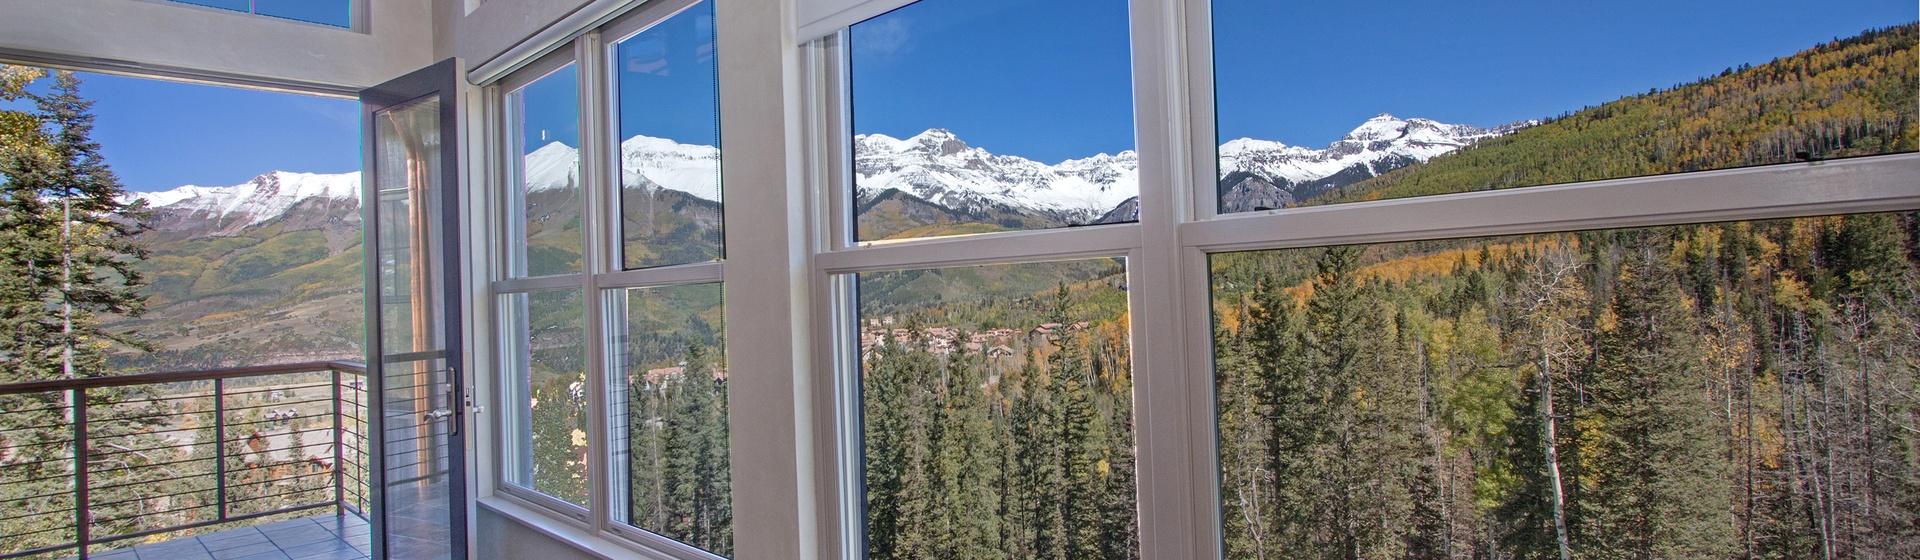 2.5-Telluride-Cassidy-Ridge-A103-Living-Area-View-Web.jpg